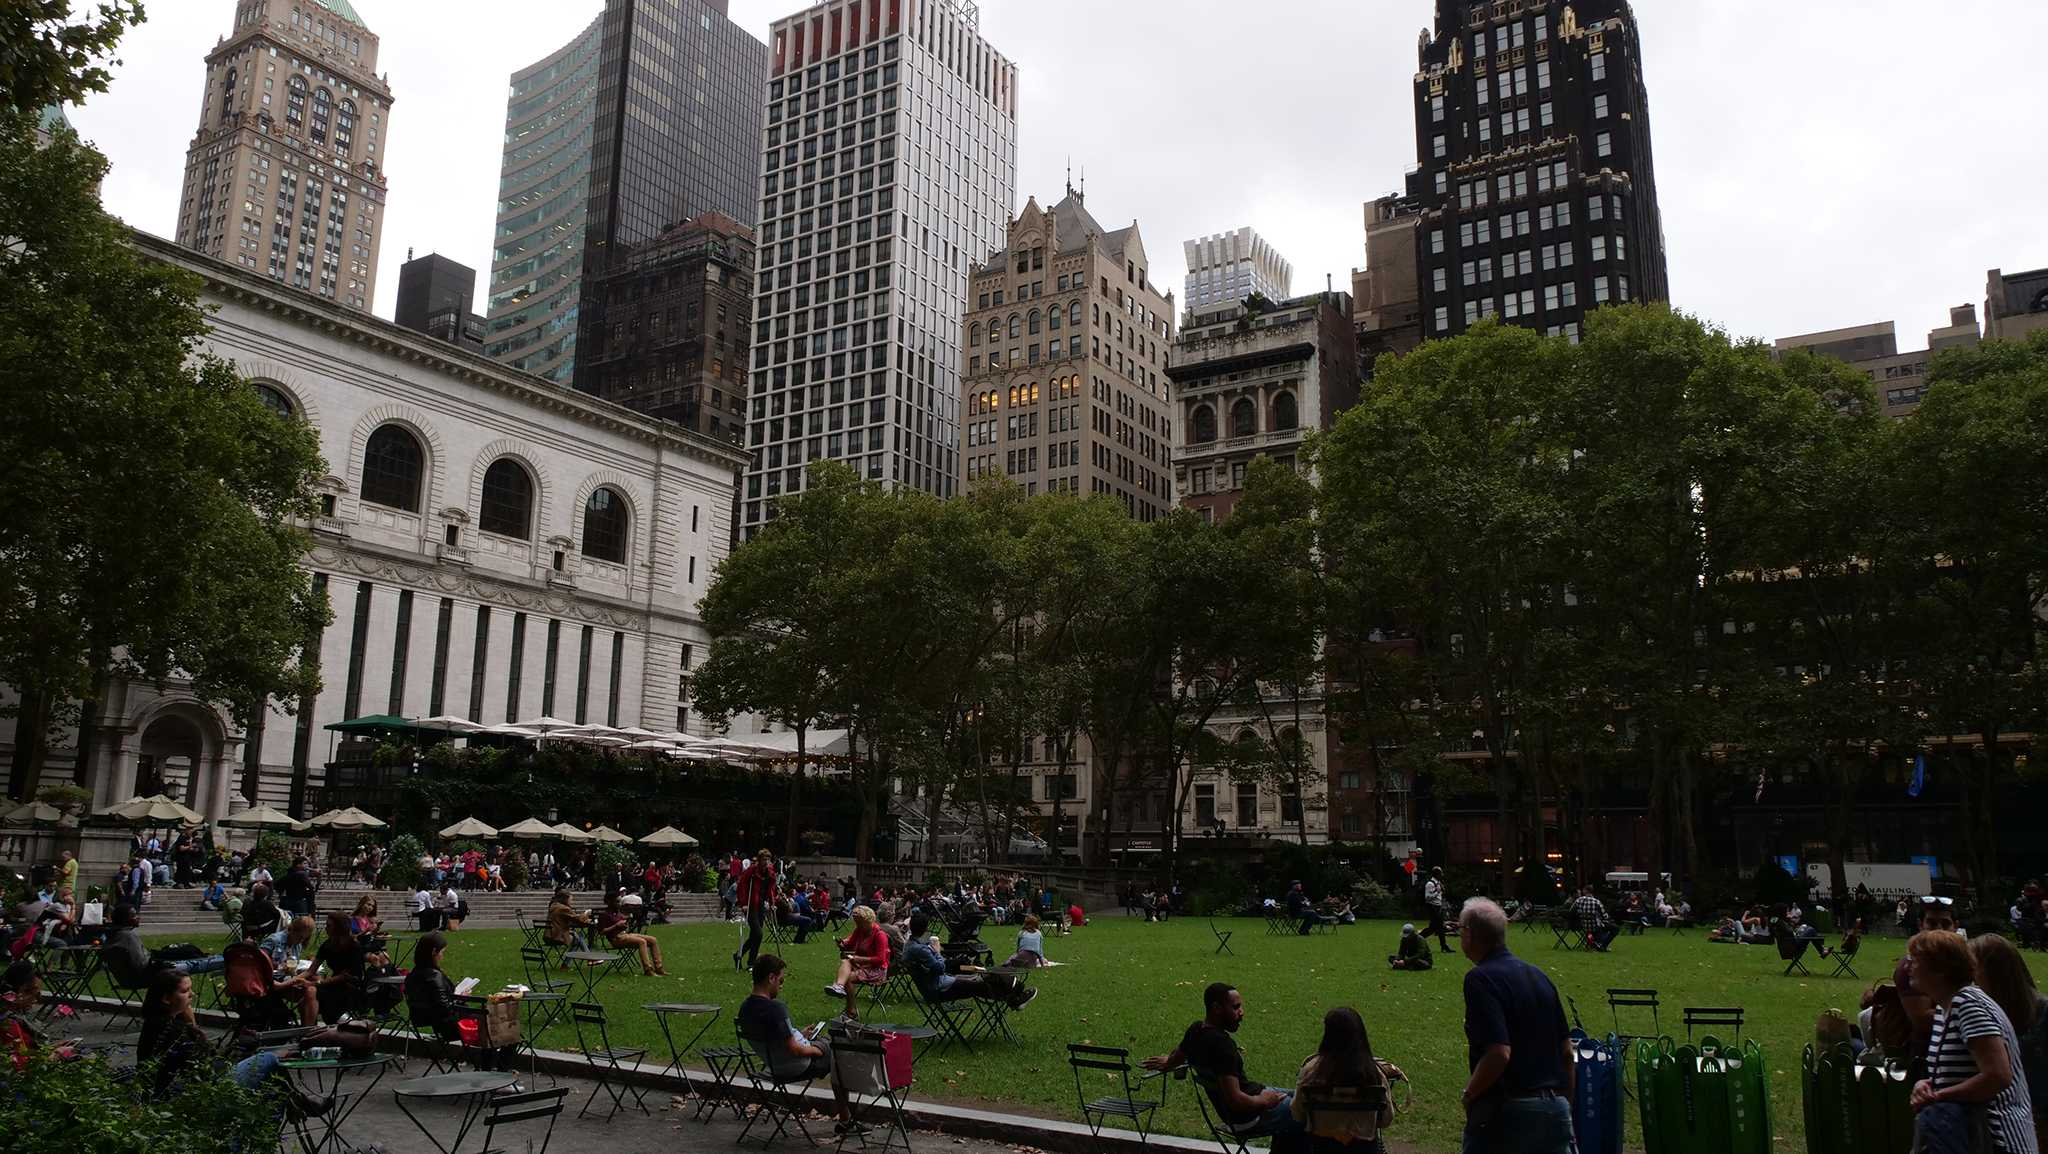 Midtown bryant park